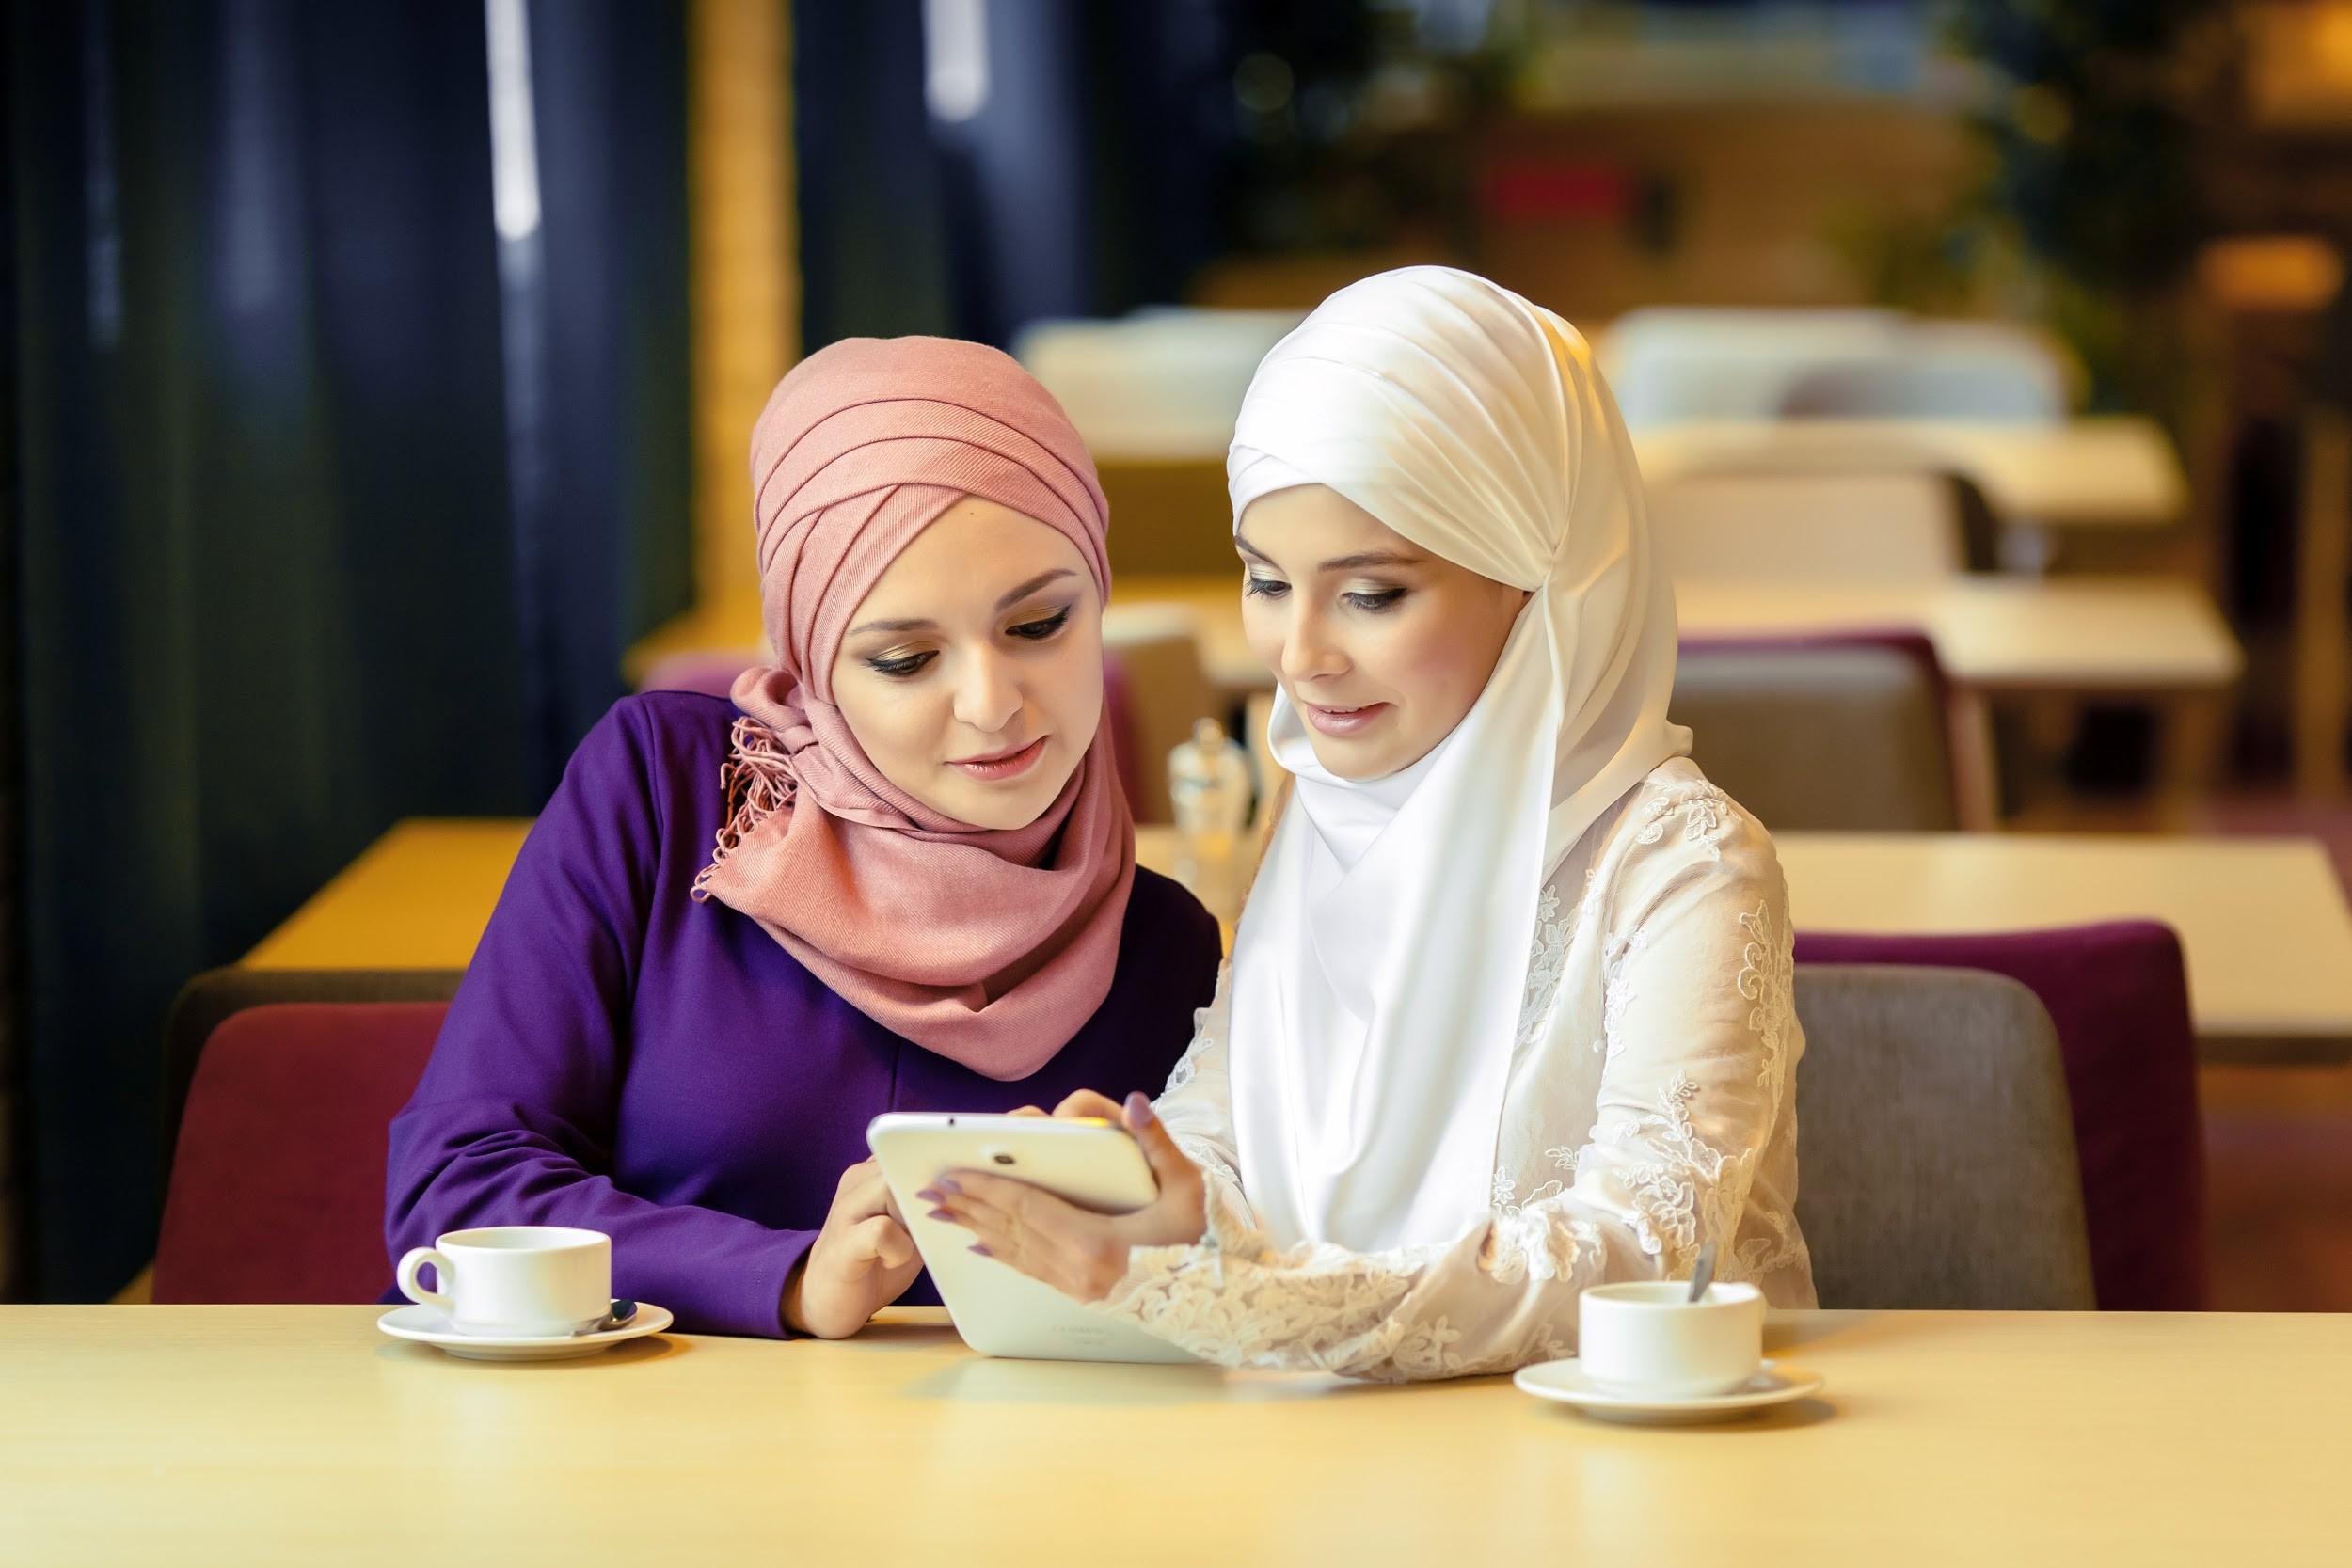 Engaging-conversations-on-social-media